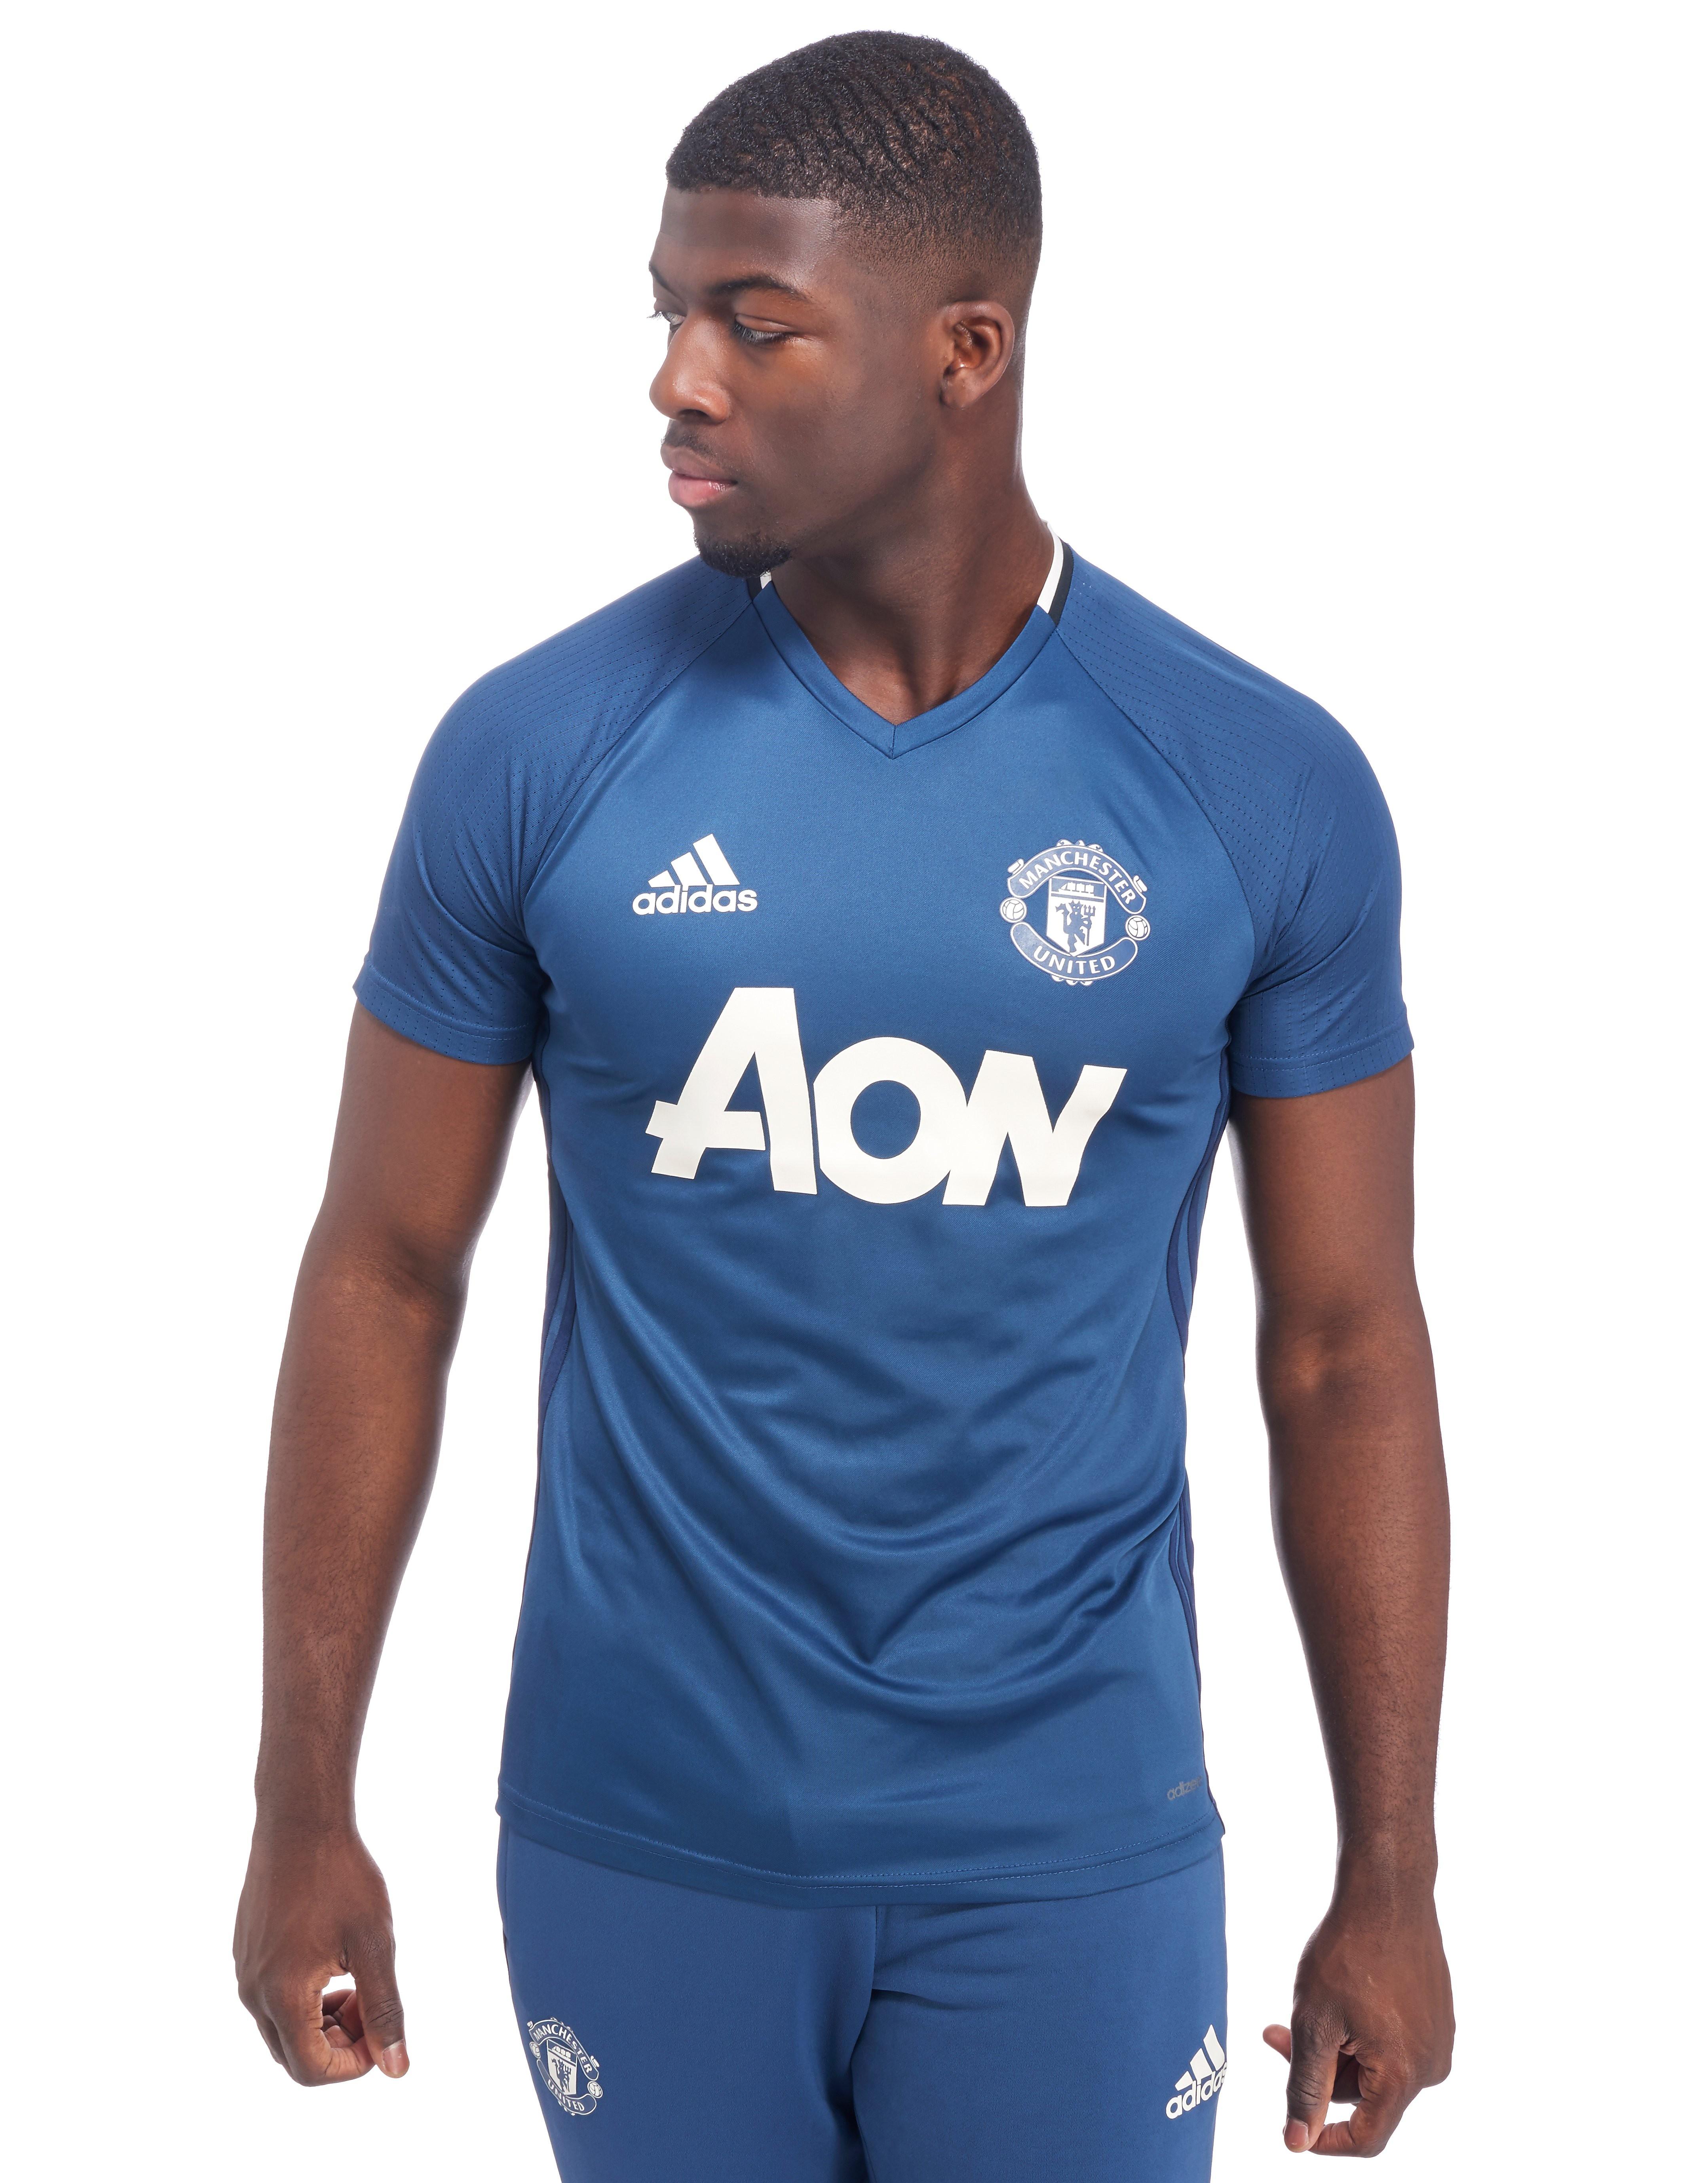 adidas Manchester United FC 2016/17 Training Jersey